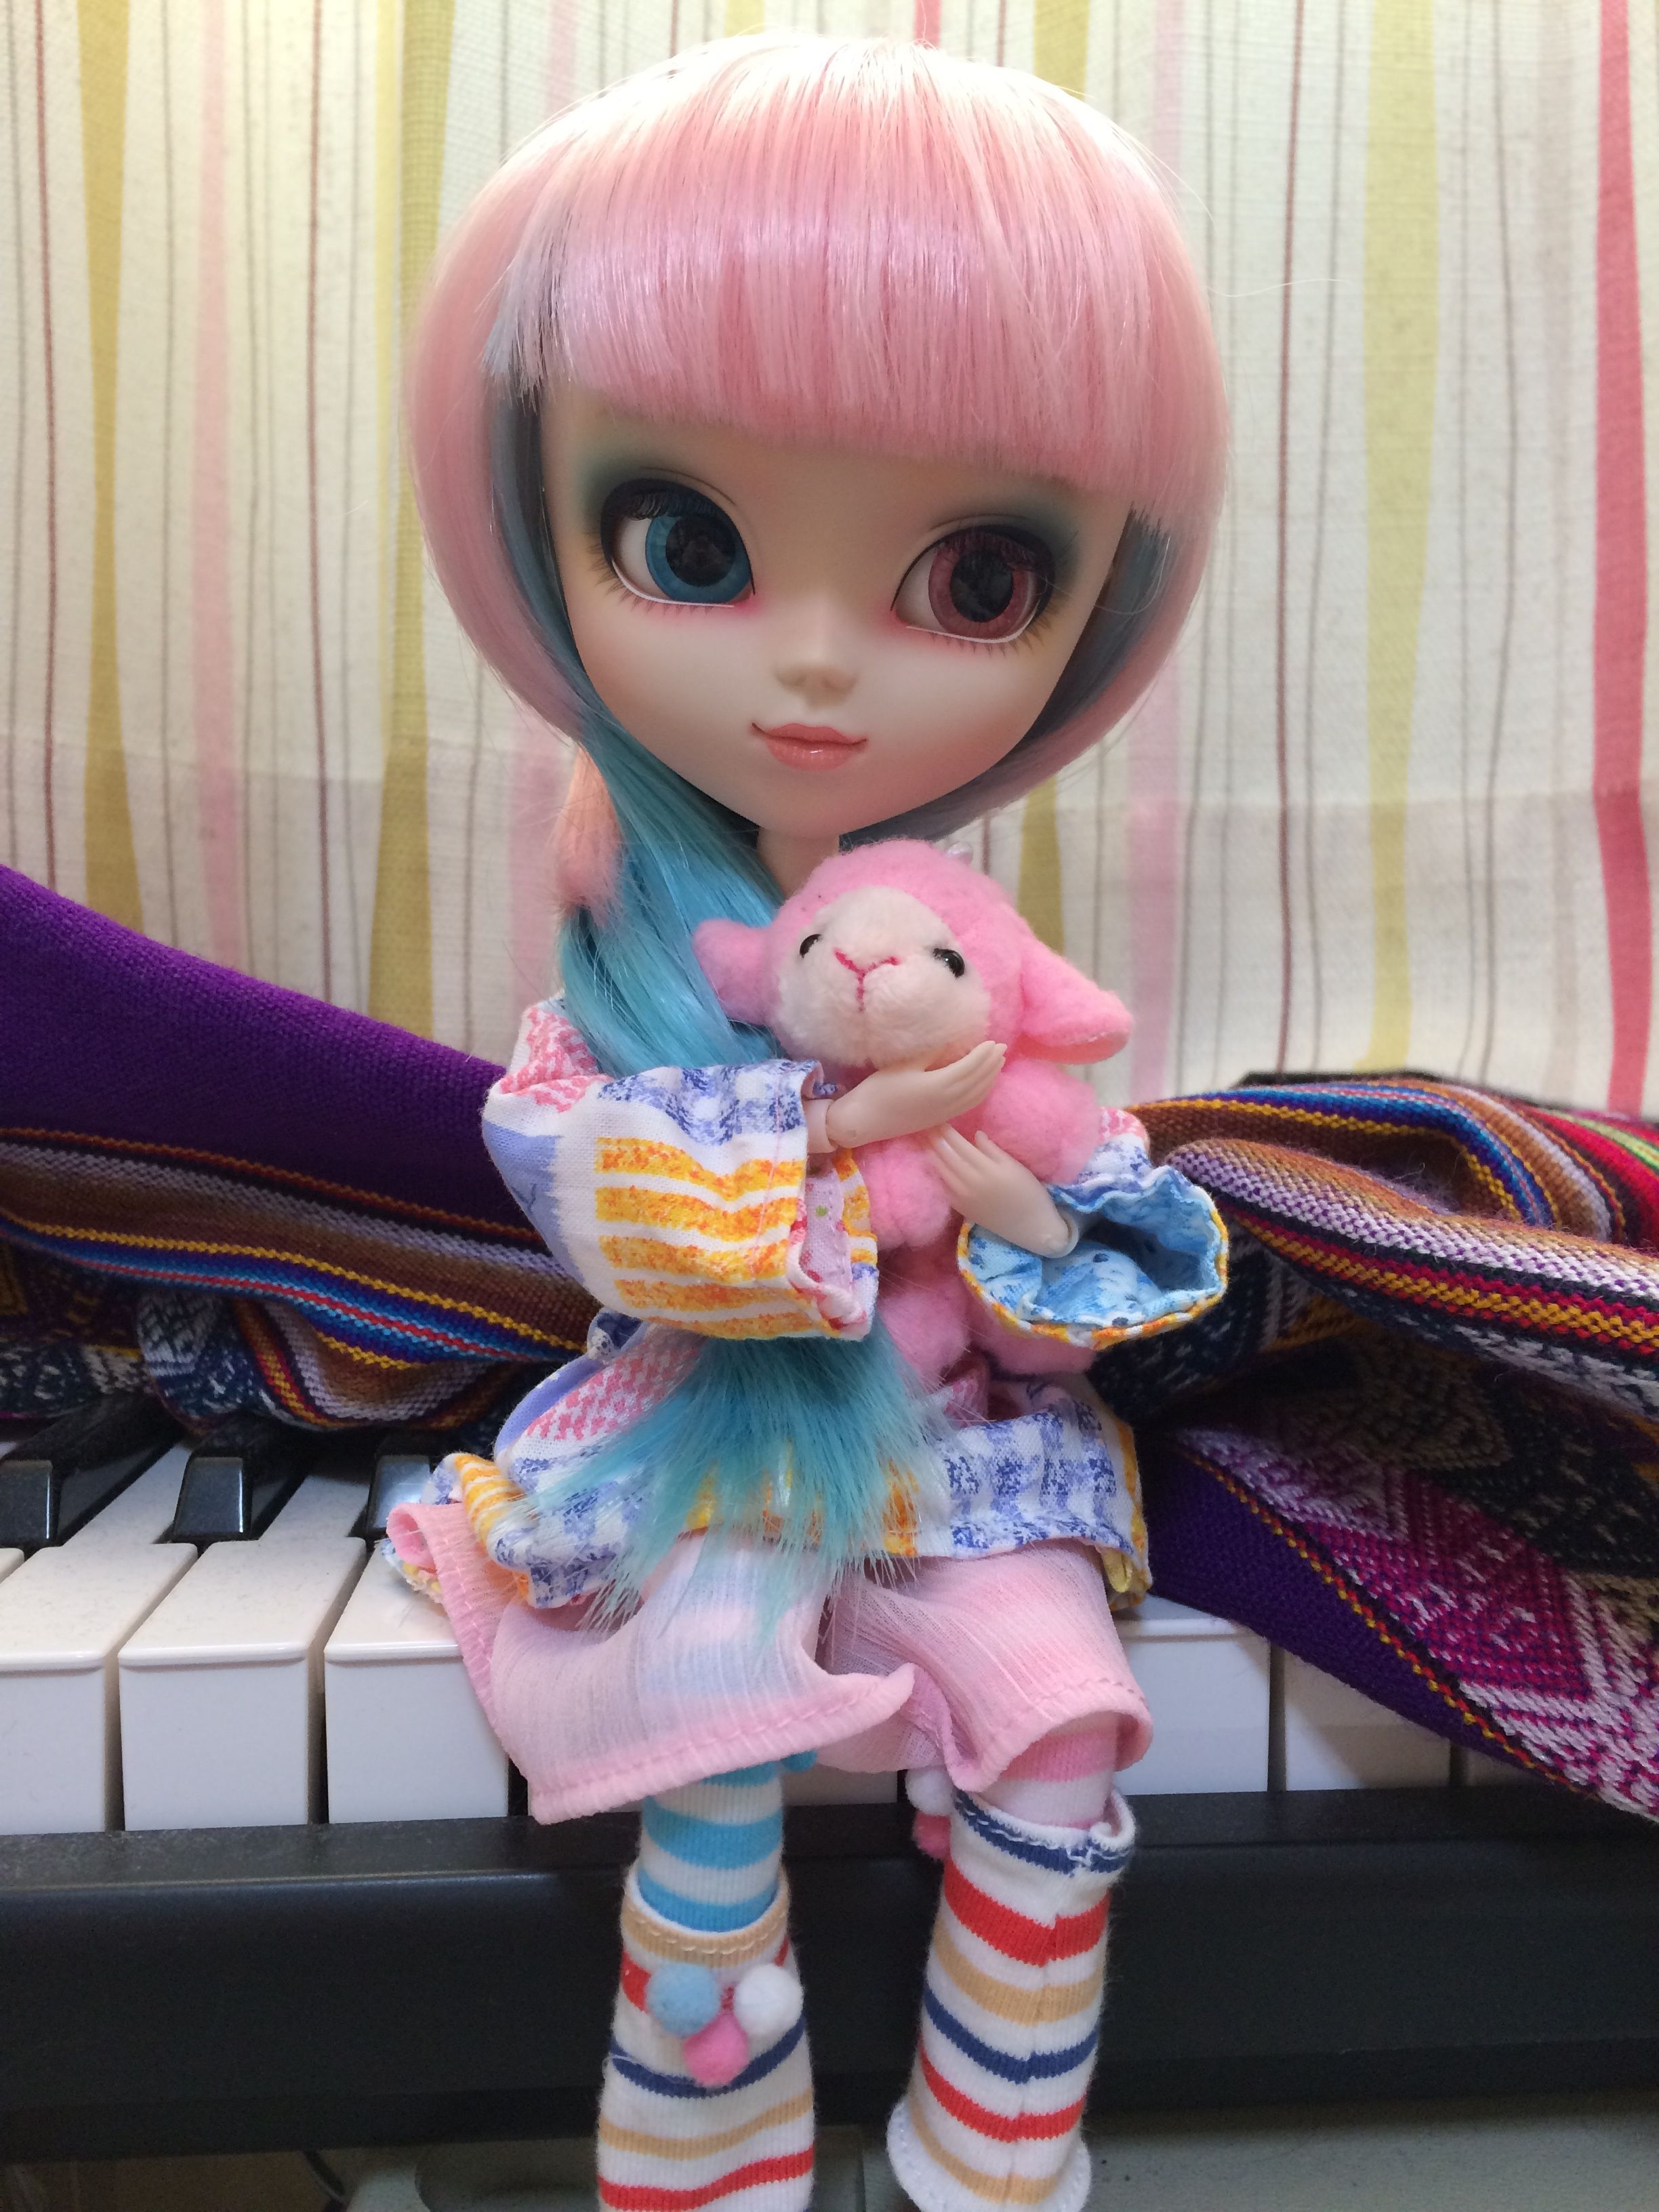 Akemi enjoying her new reversible dress.